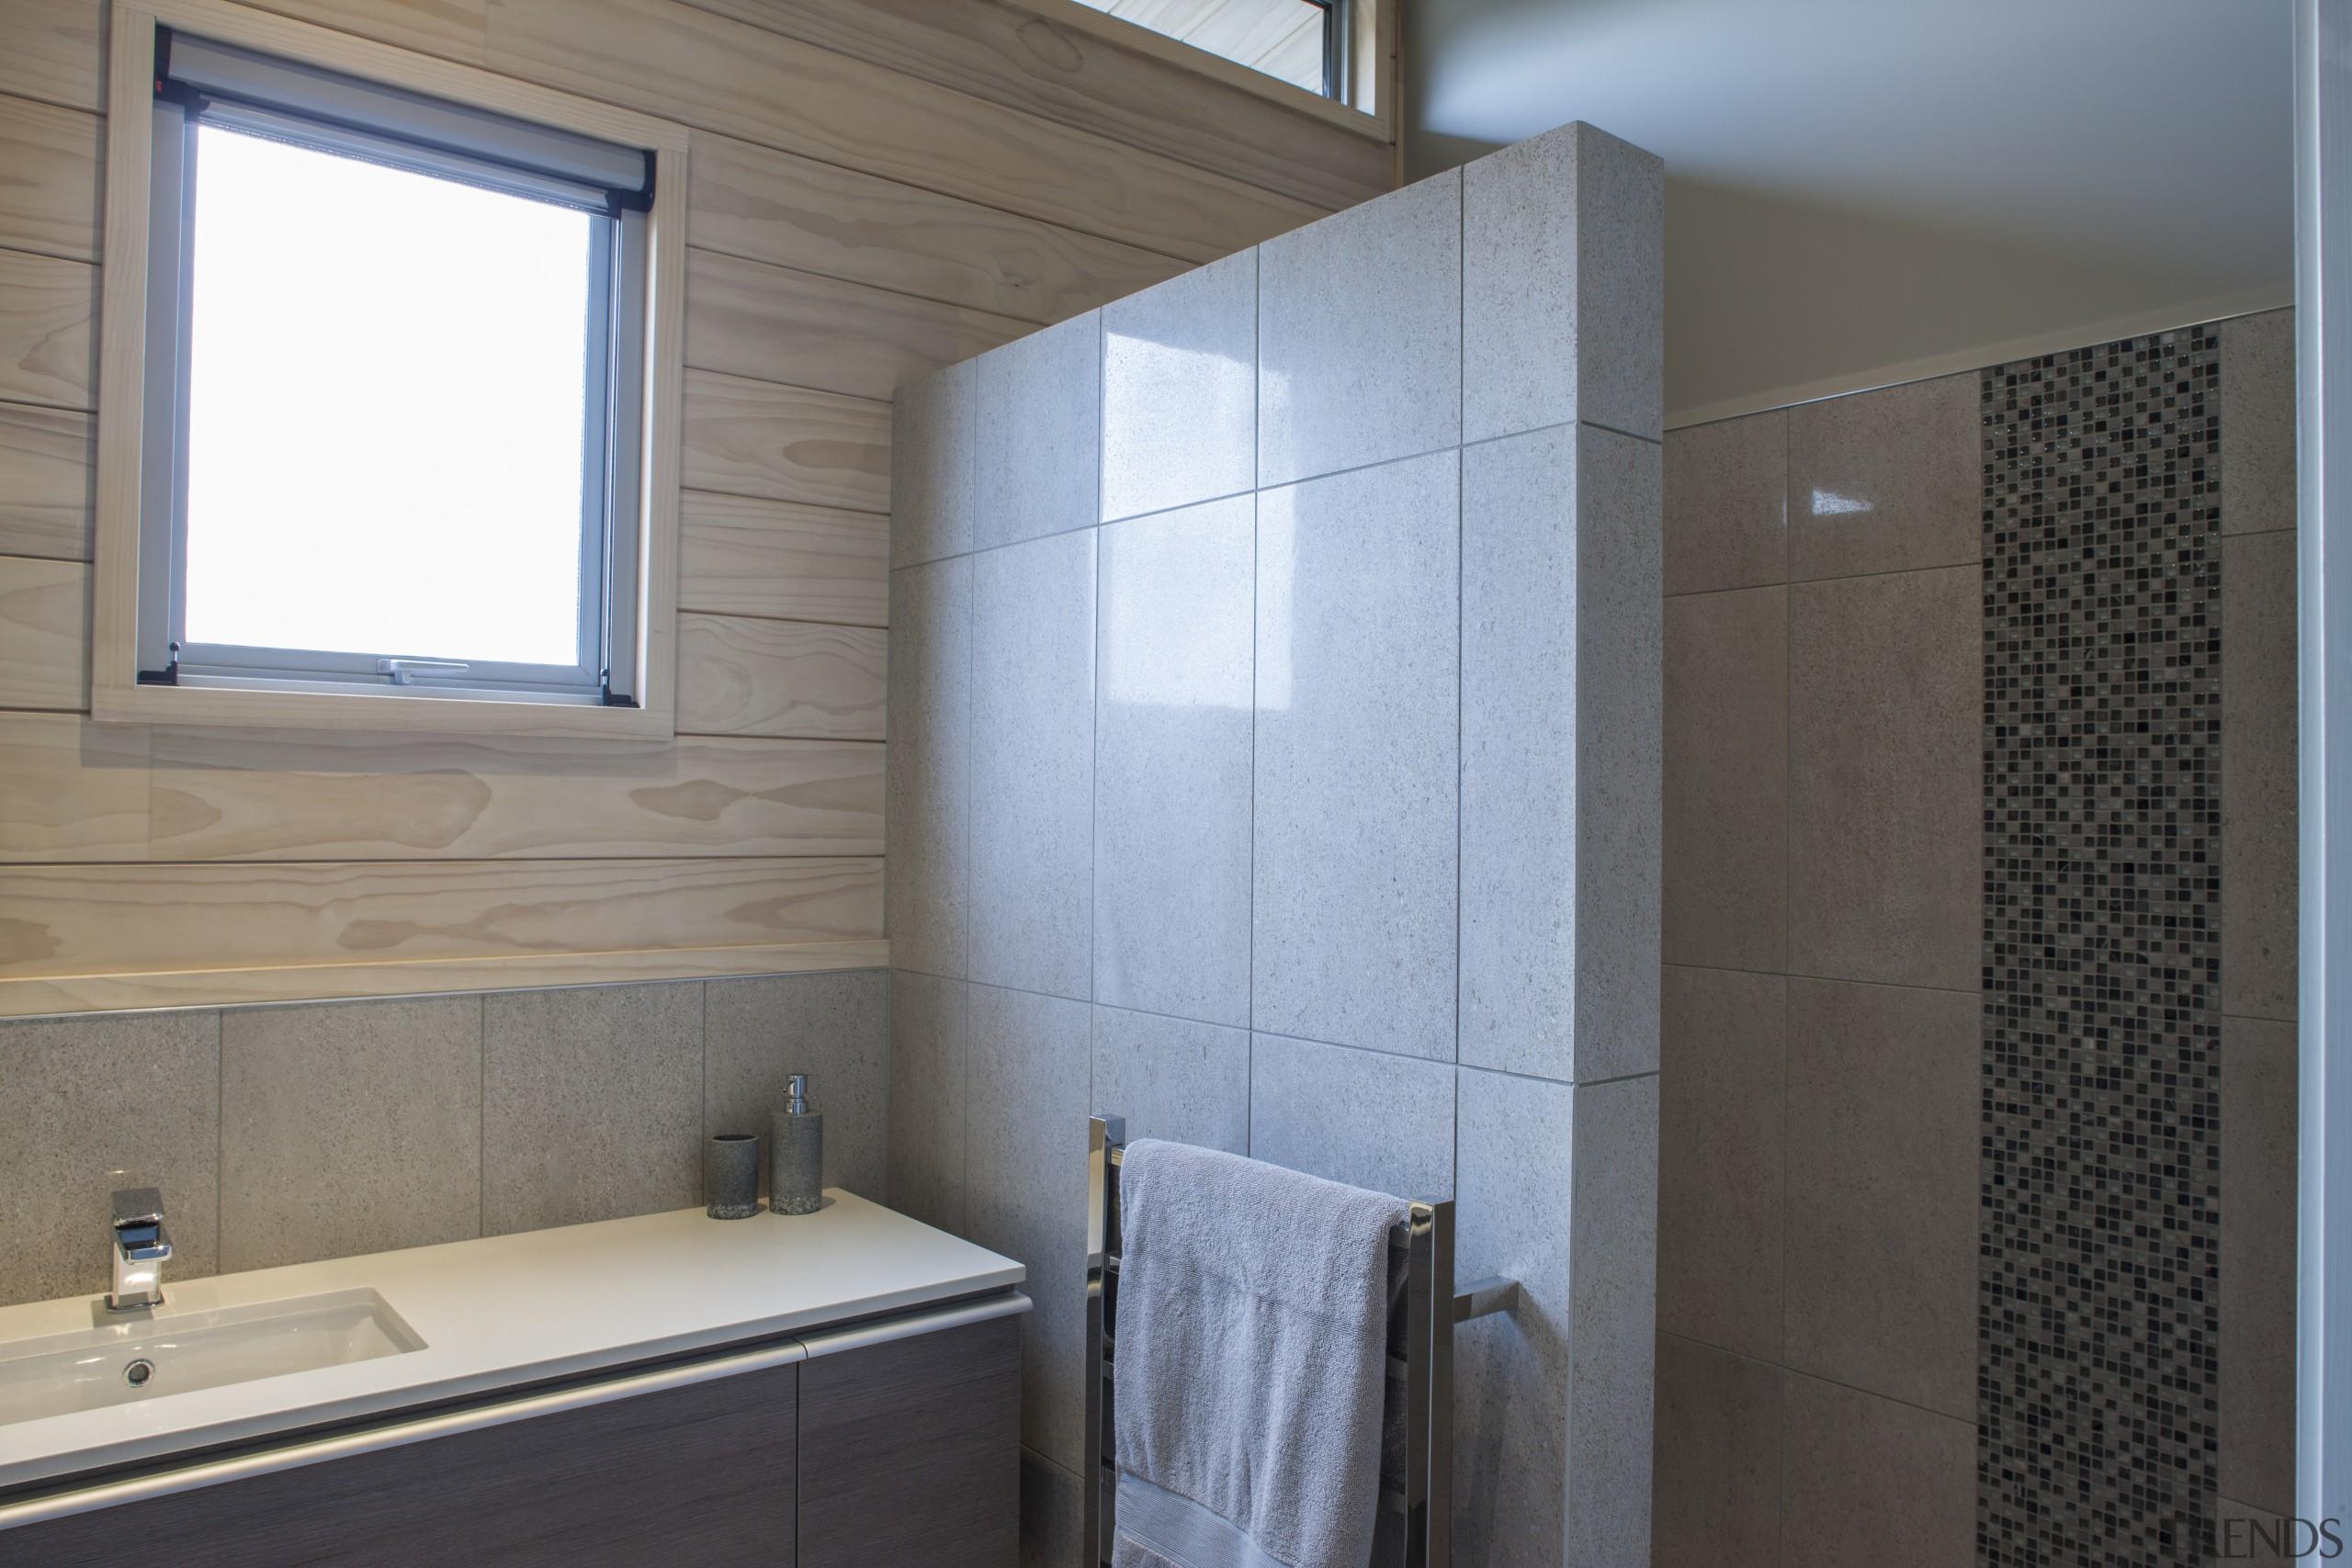 Lockwood Home built by Peter Richards - Lockwood bathroom, bathroom accessory, bathroom cabinet, floor, flooring, home, interior design, room, tile, wall, gray